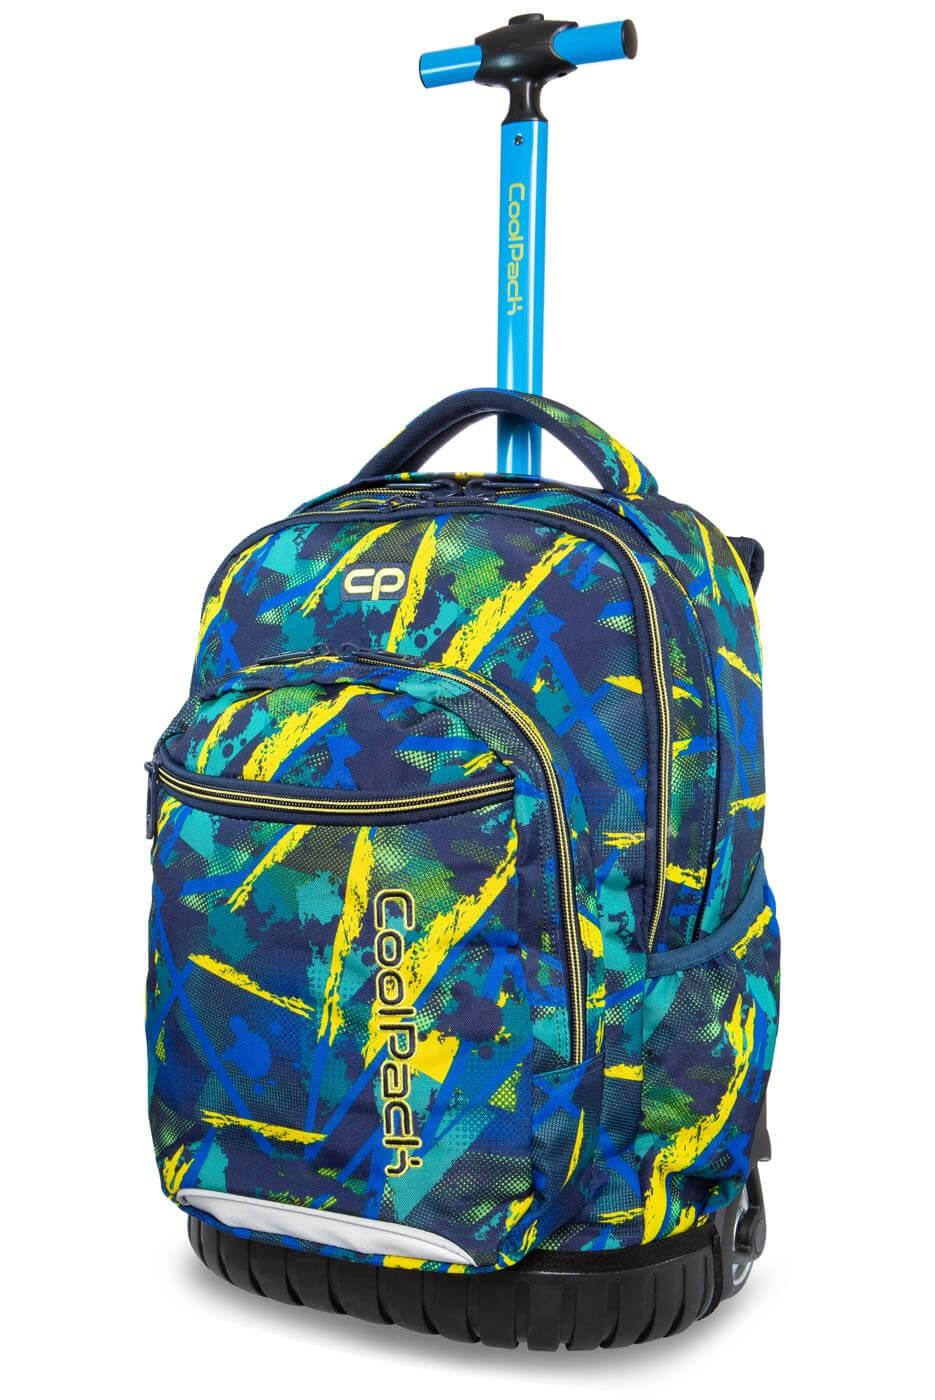 006f6180800cf Kolorowy plecak na kółkach w plamki CoolPack Abstract Yellow Swift